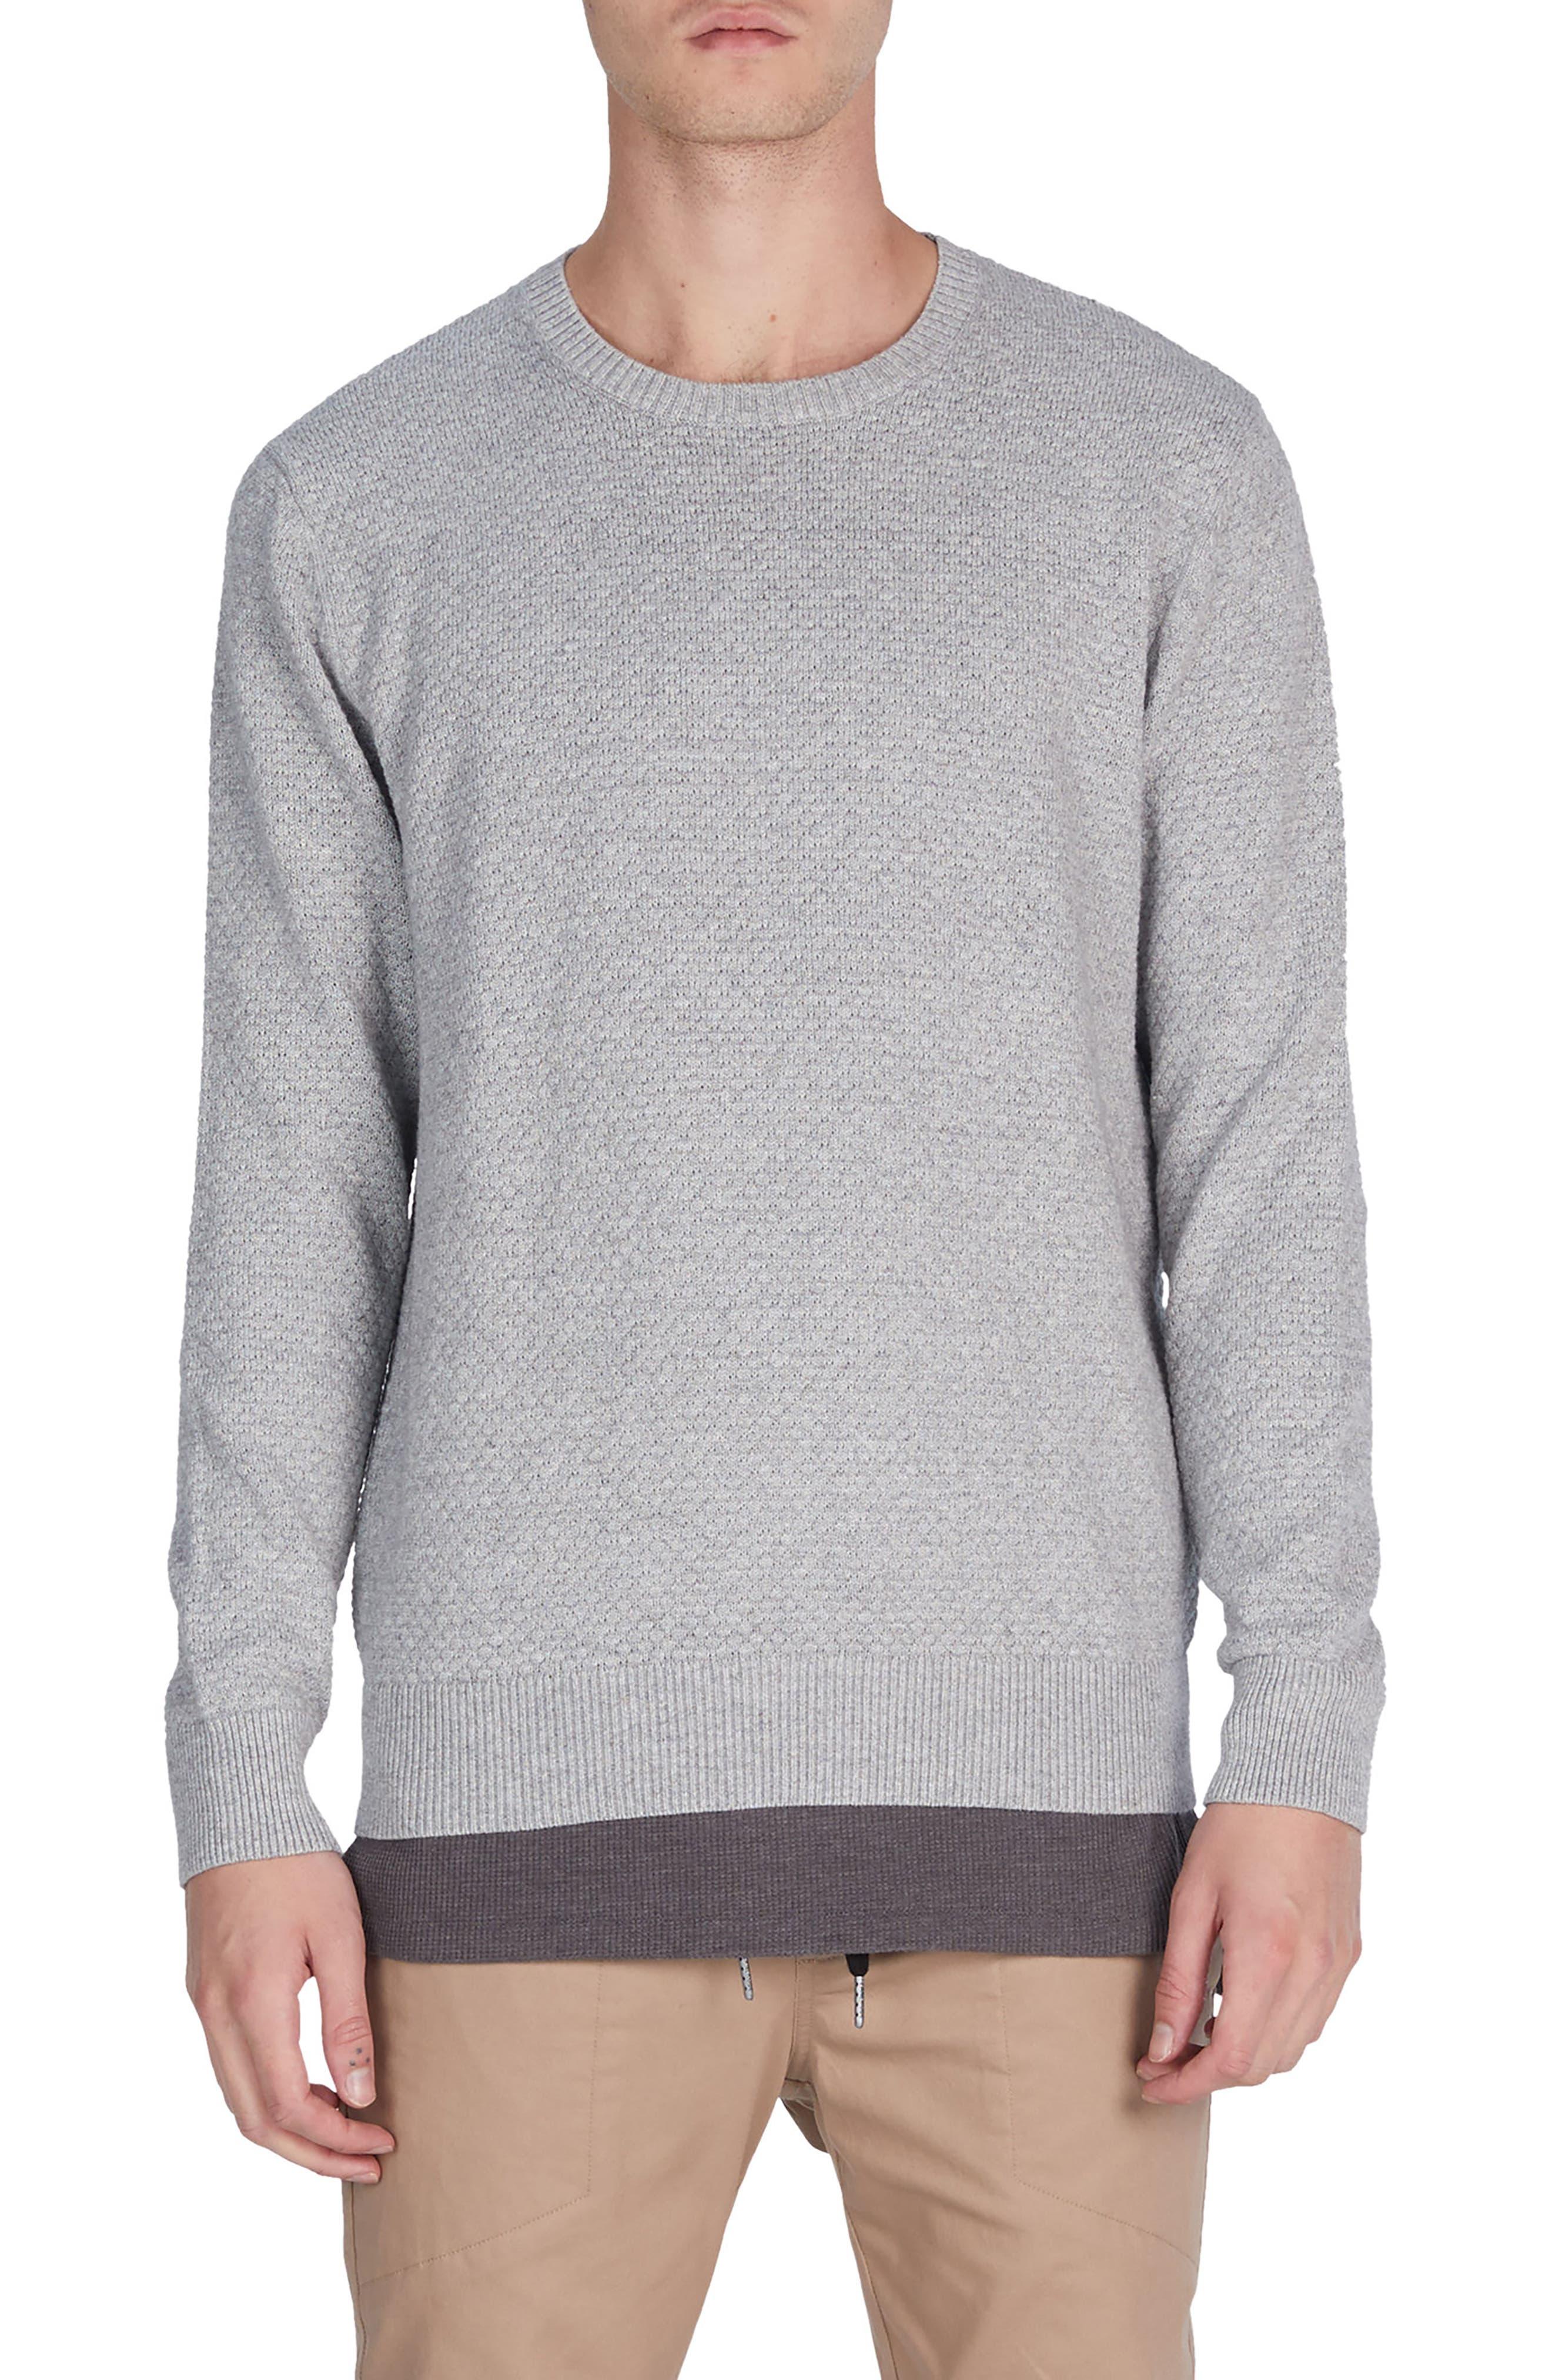 Grip Crewneck Sweater,                         Main,                         color, 030